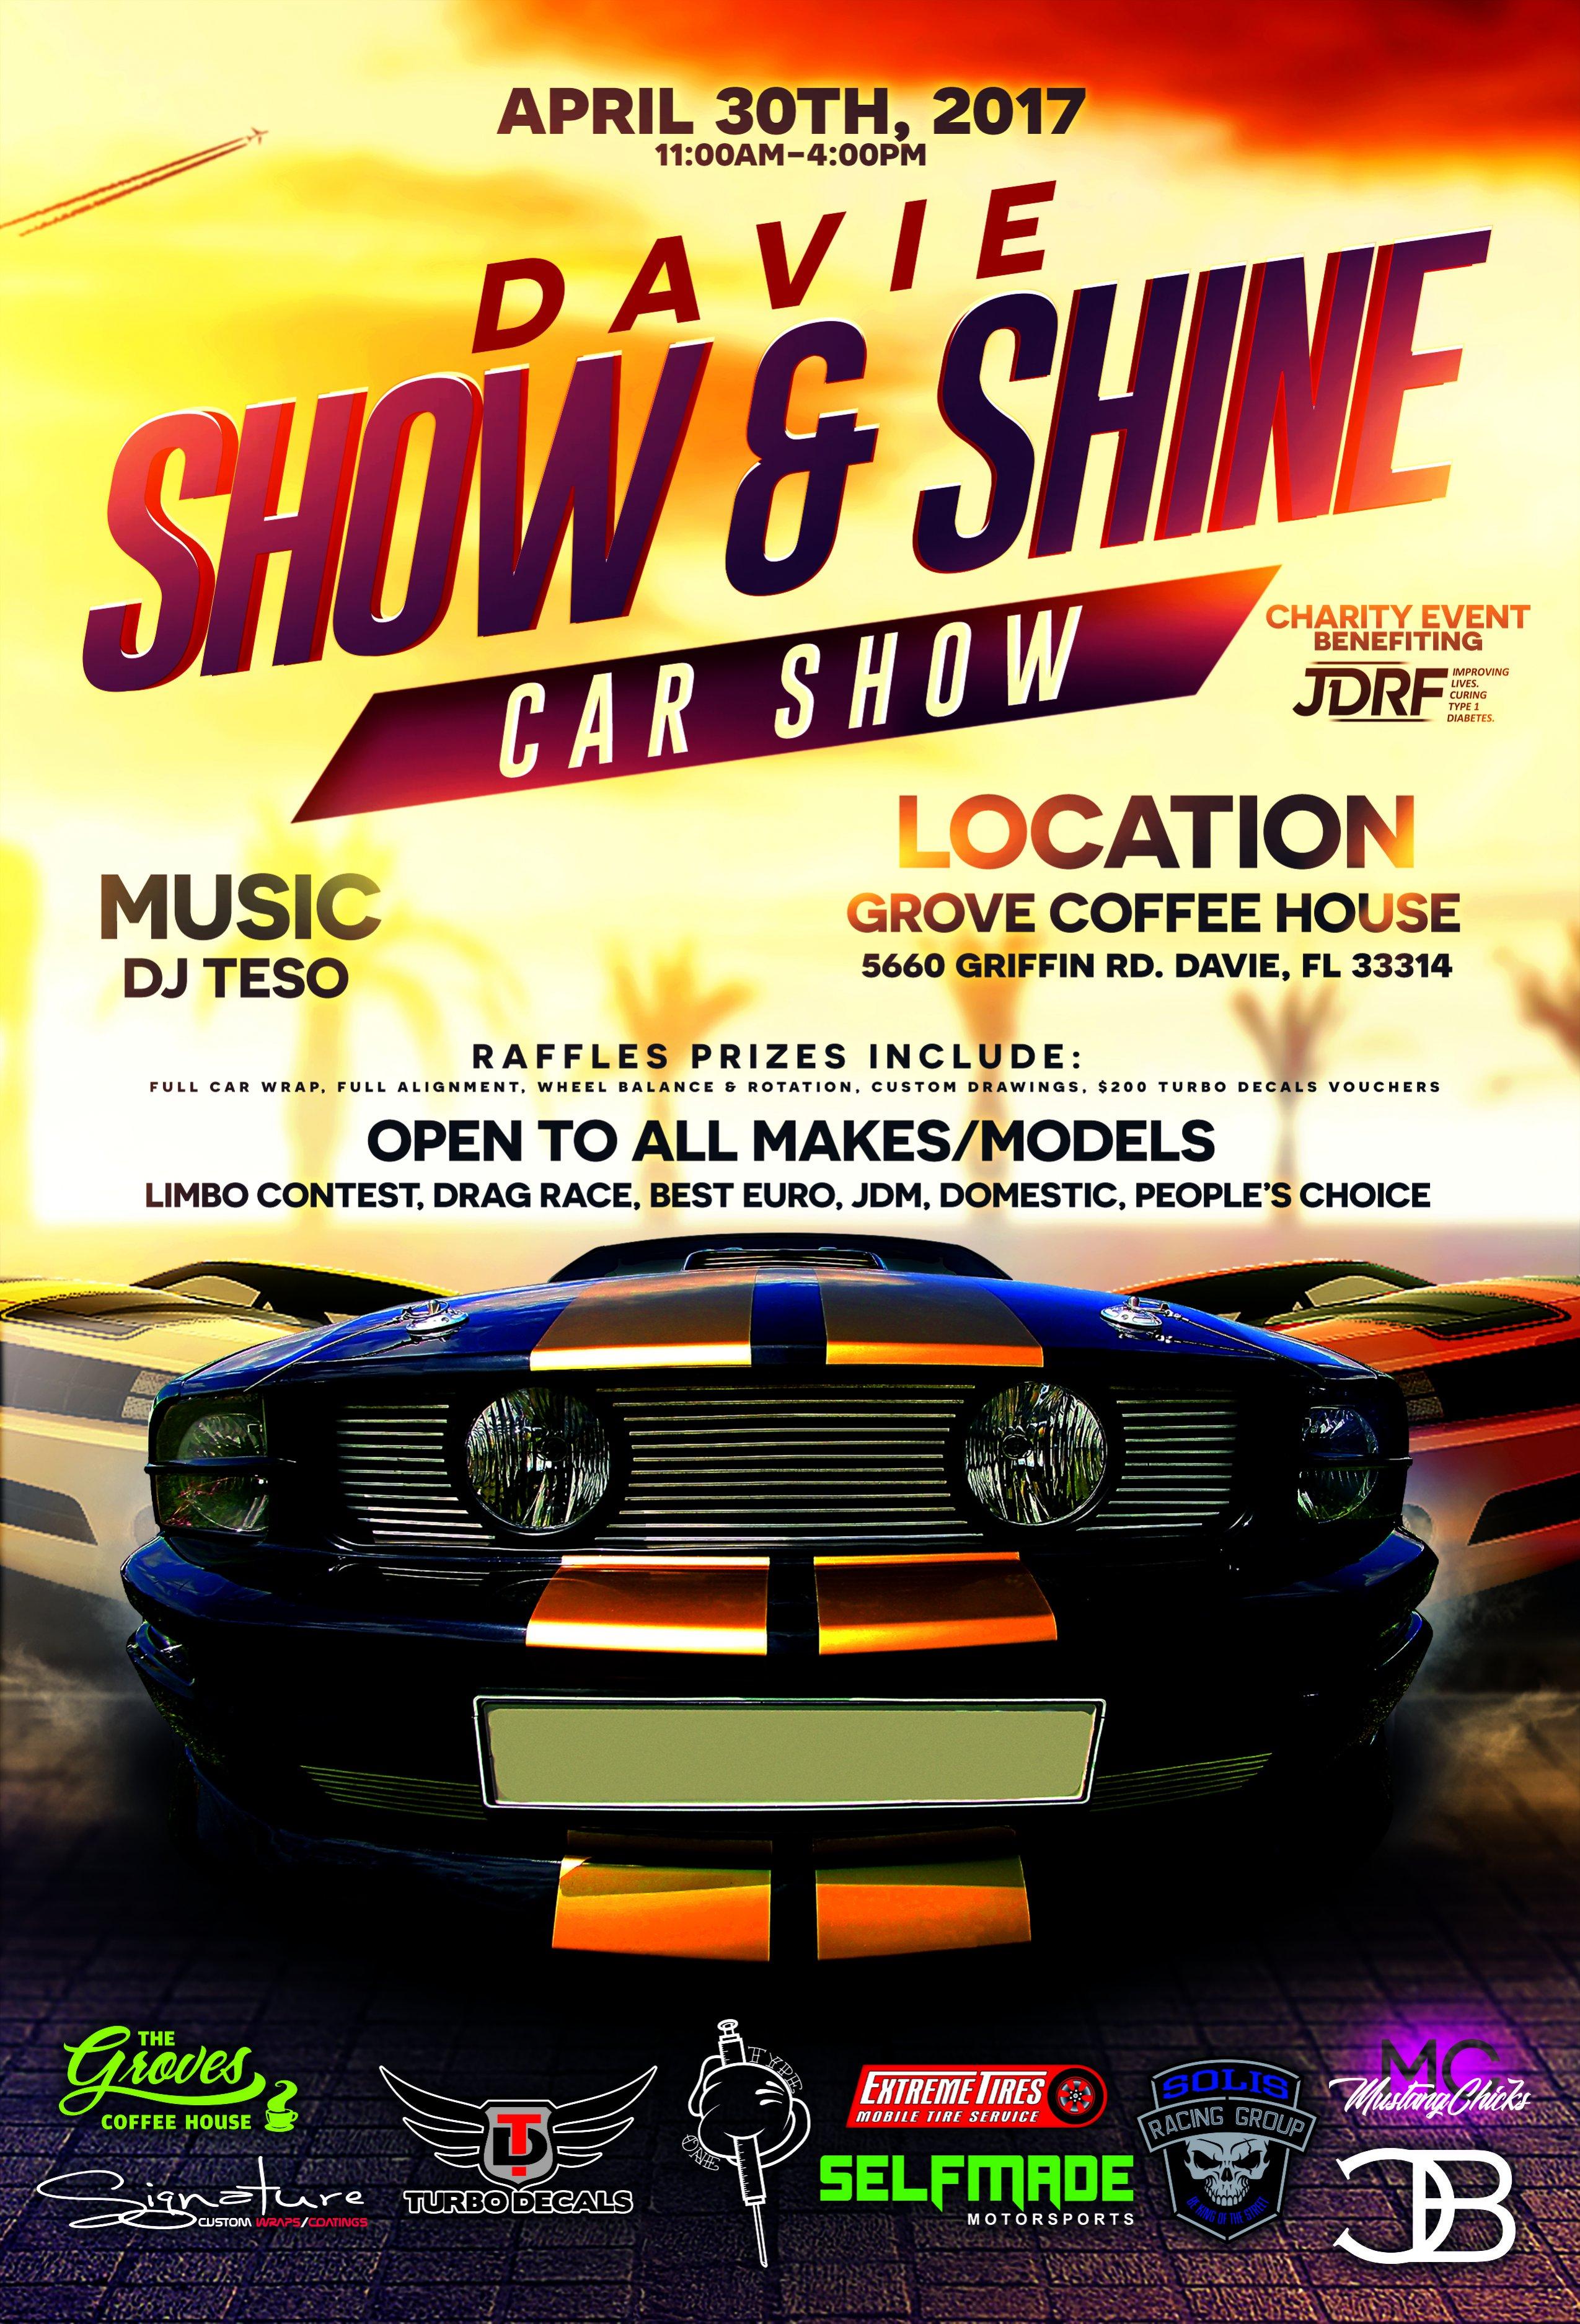 Click image for larger version  Name:Davie Show & Shine Car Show %28PRINT%29_2 (1).jpg Views:29 Size:1.14 MB ID:226874